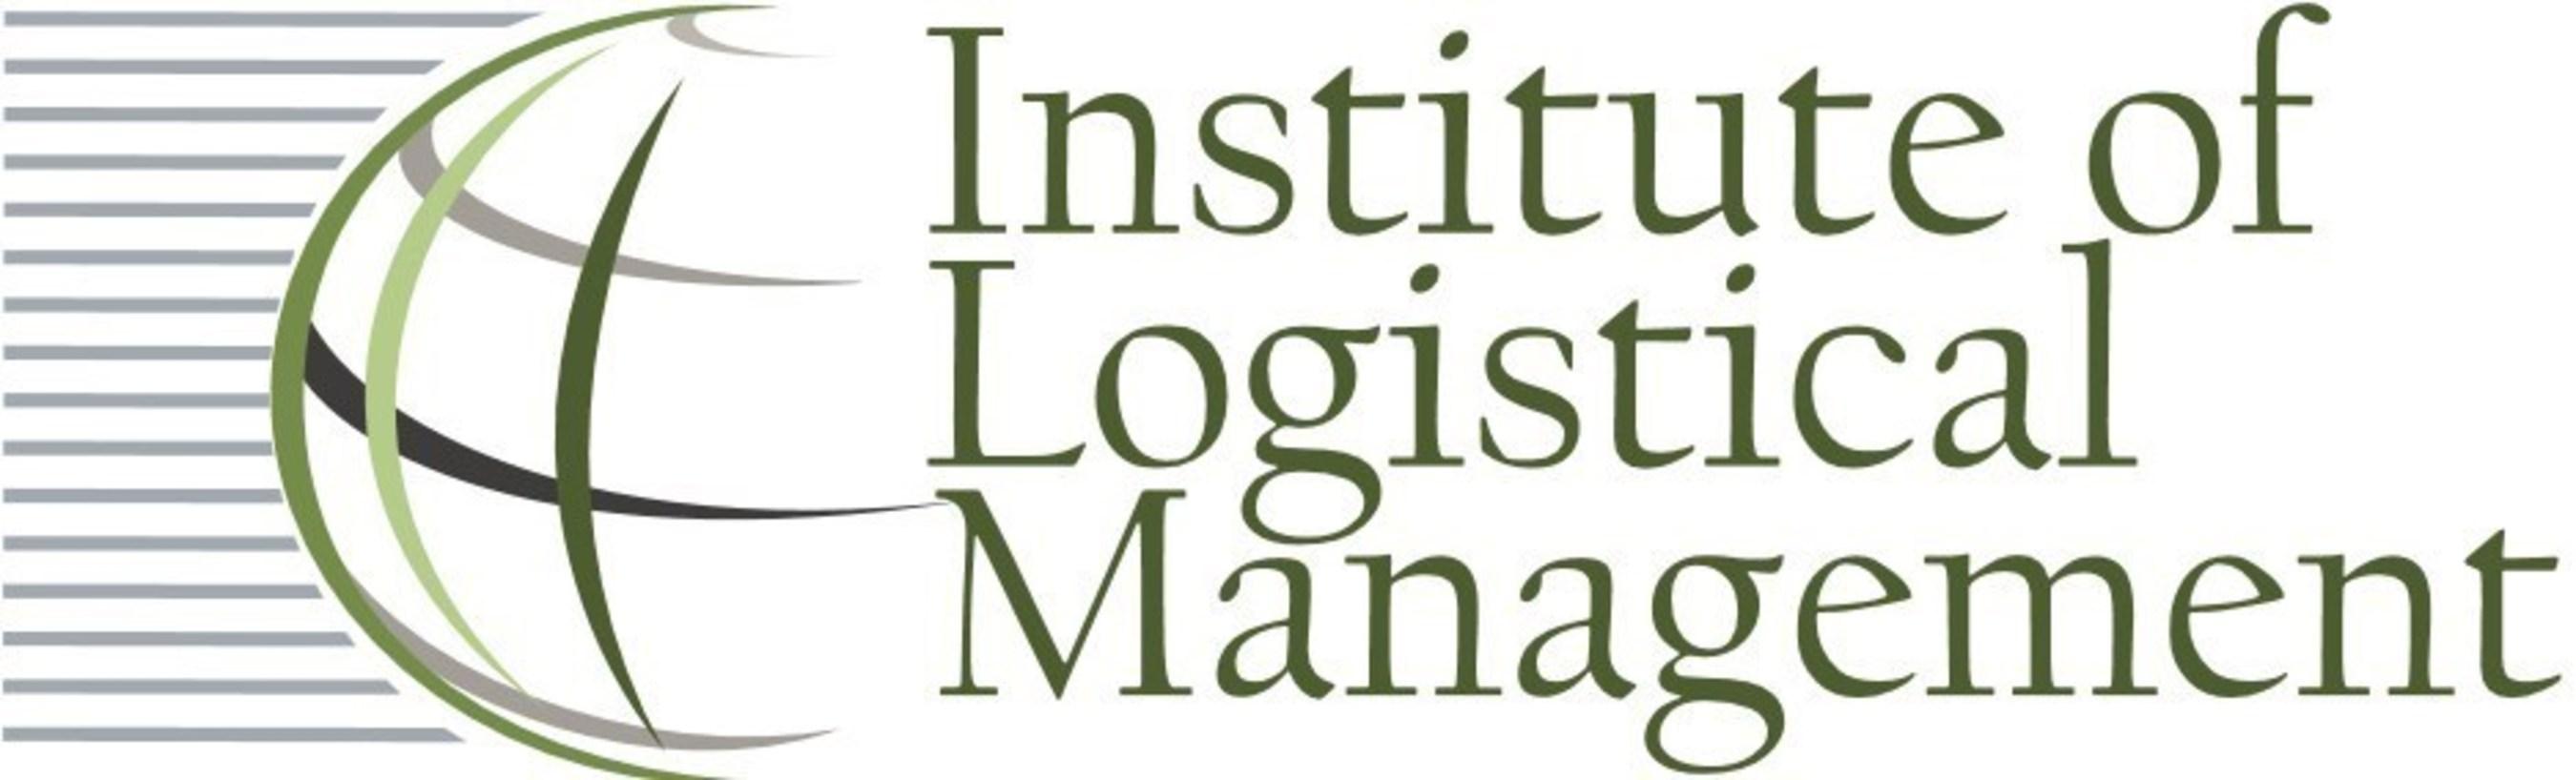 Institute of Logistical Management (PRNewsFoto/William Loveland College)